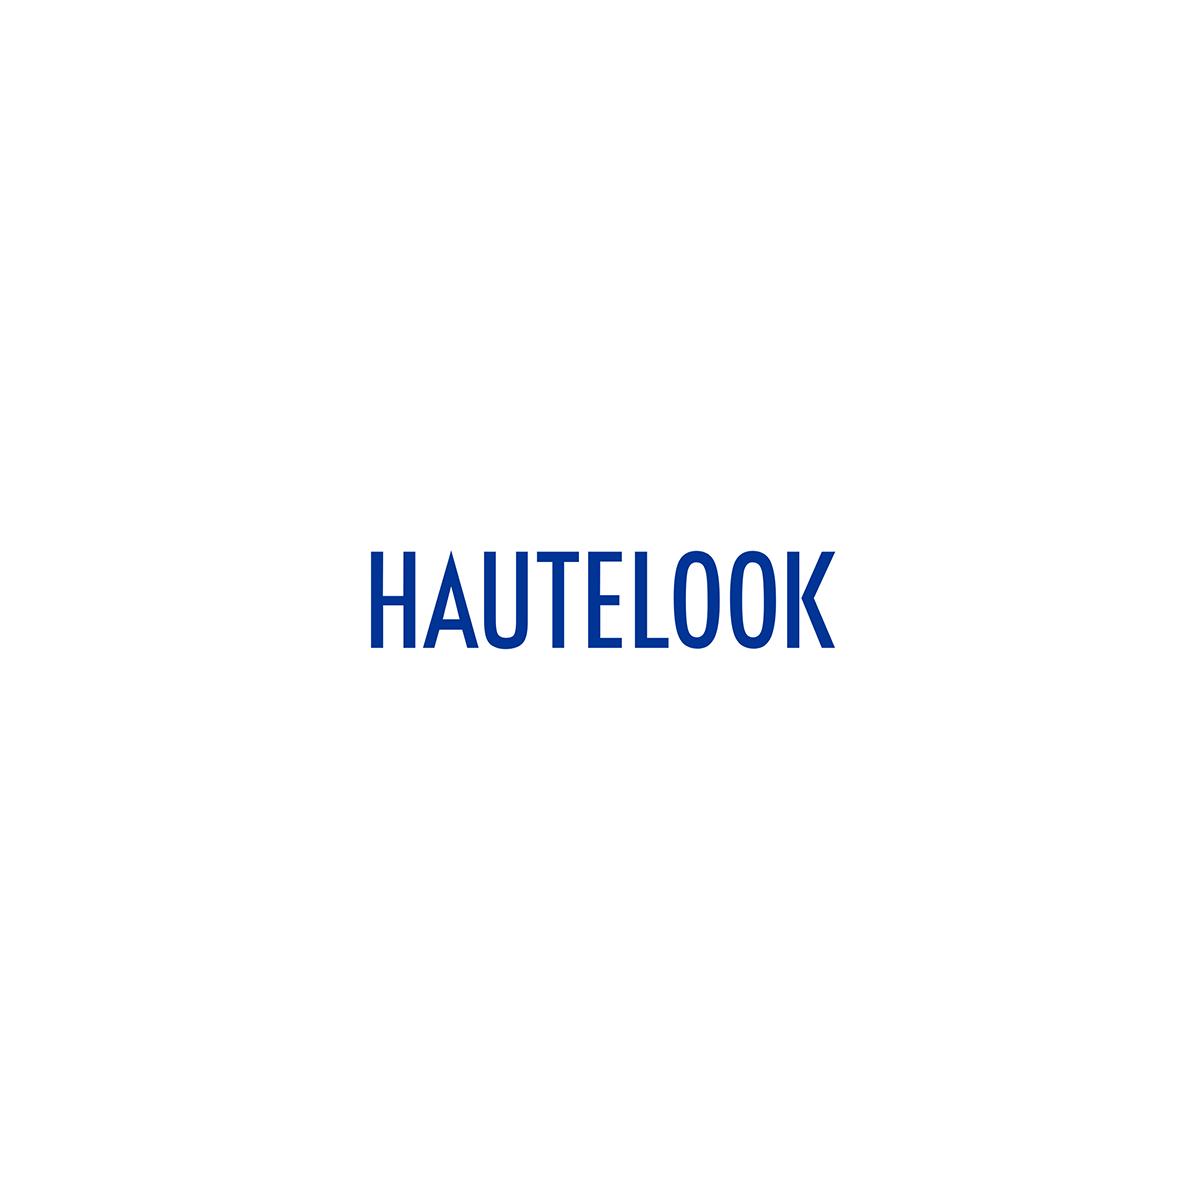 HauteLook, A Nordstrom Company